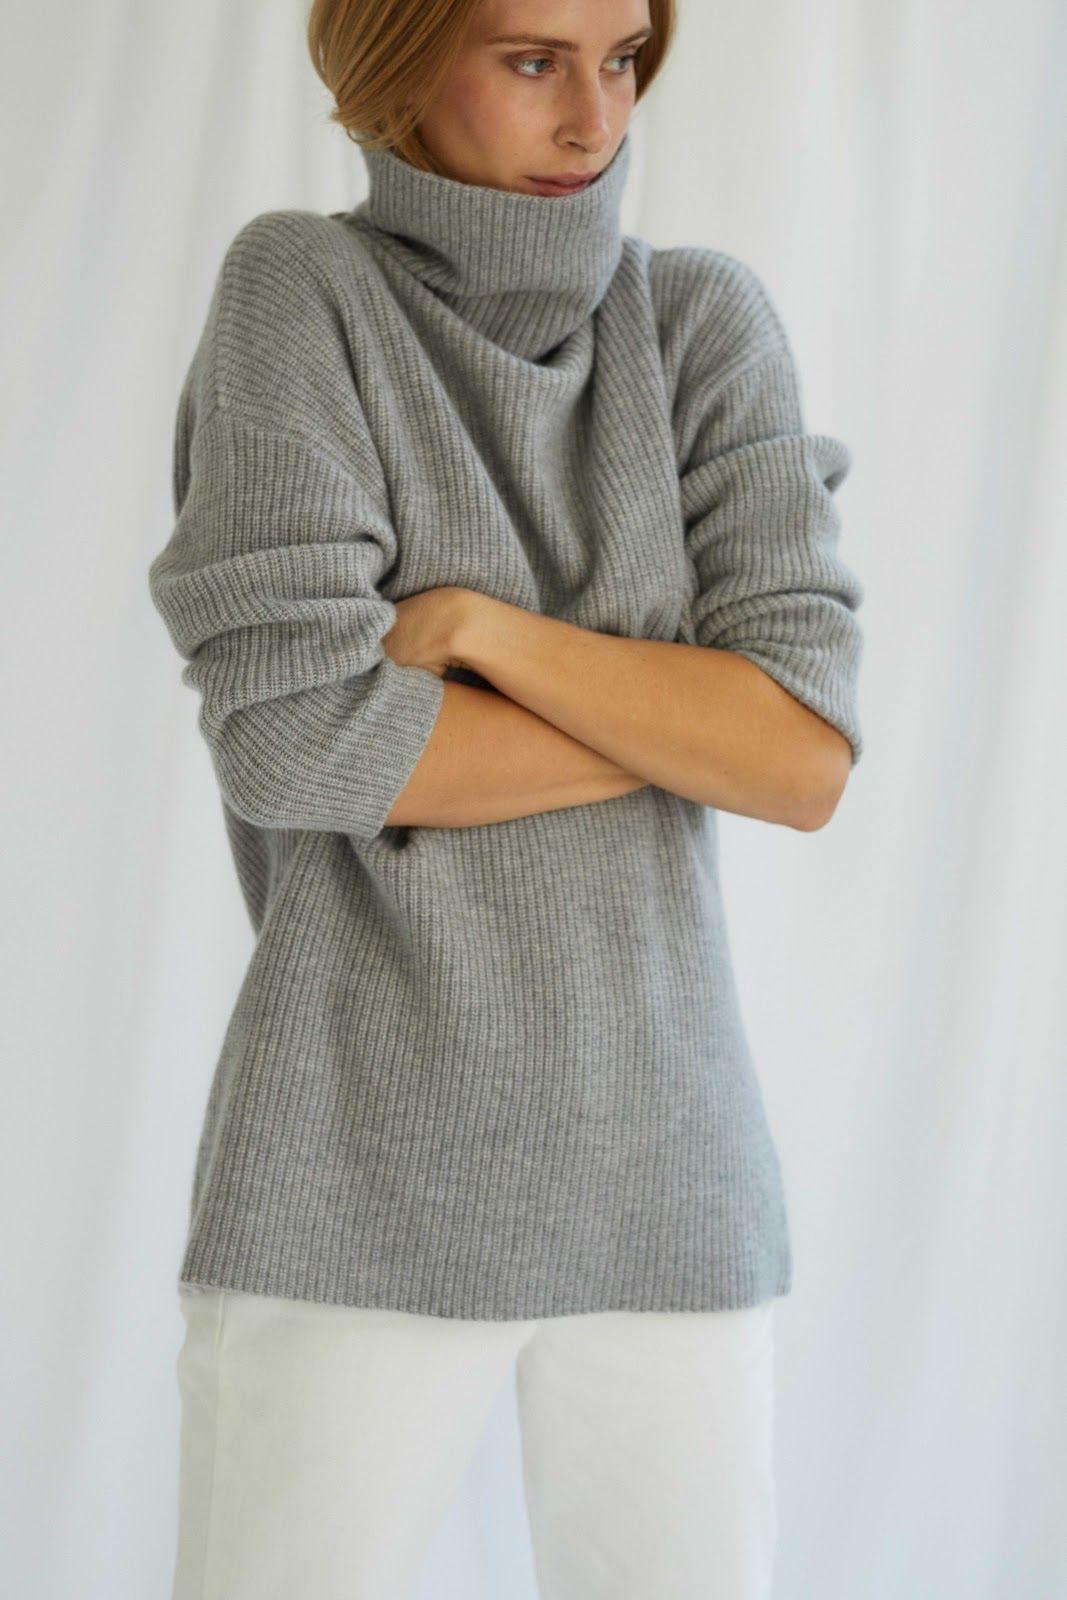 Oversized Rib Sweater